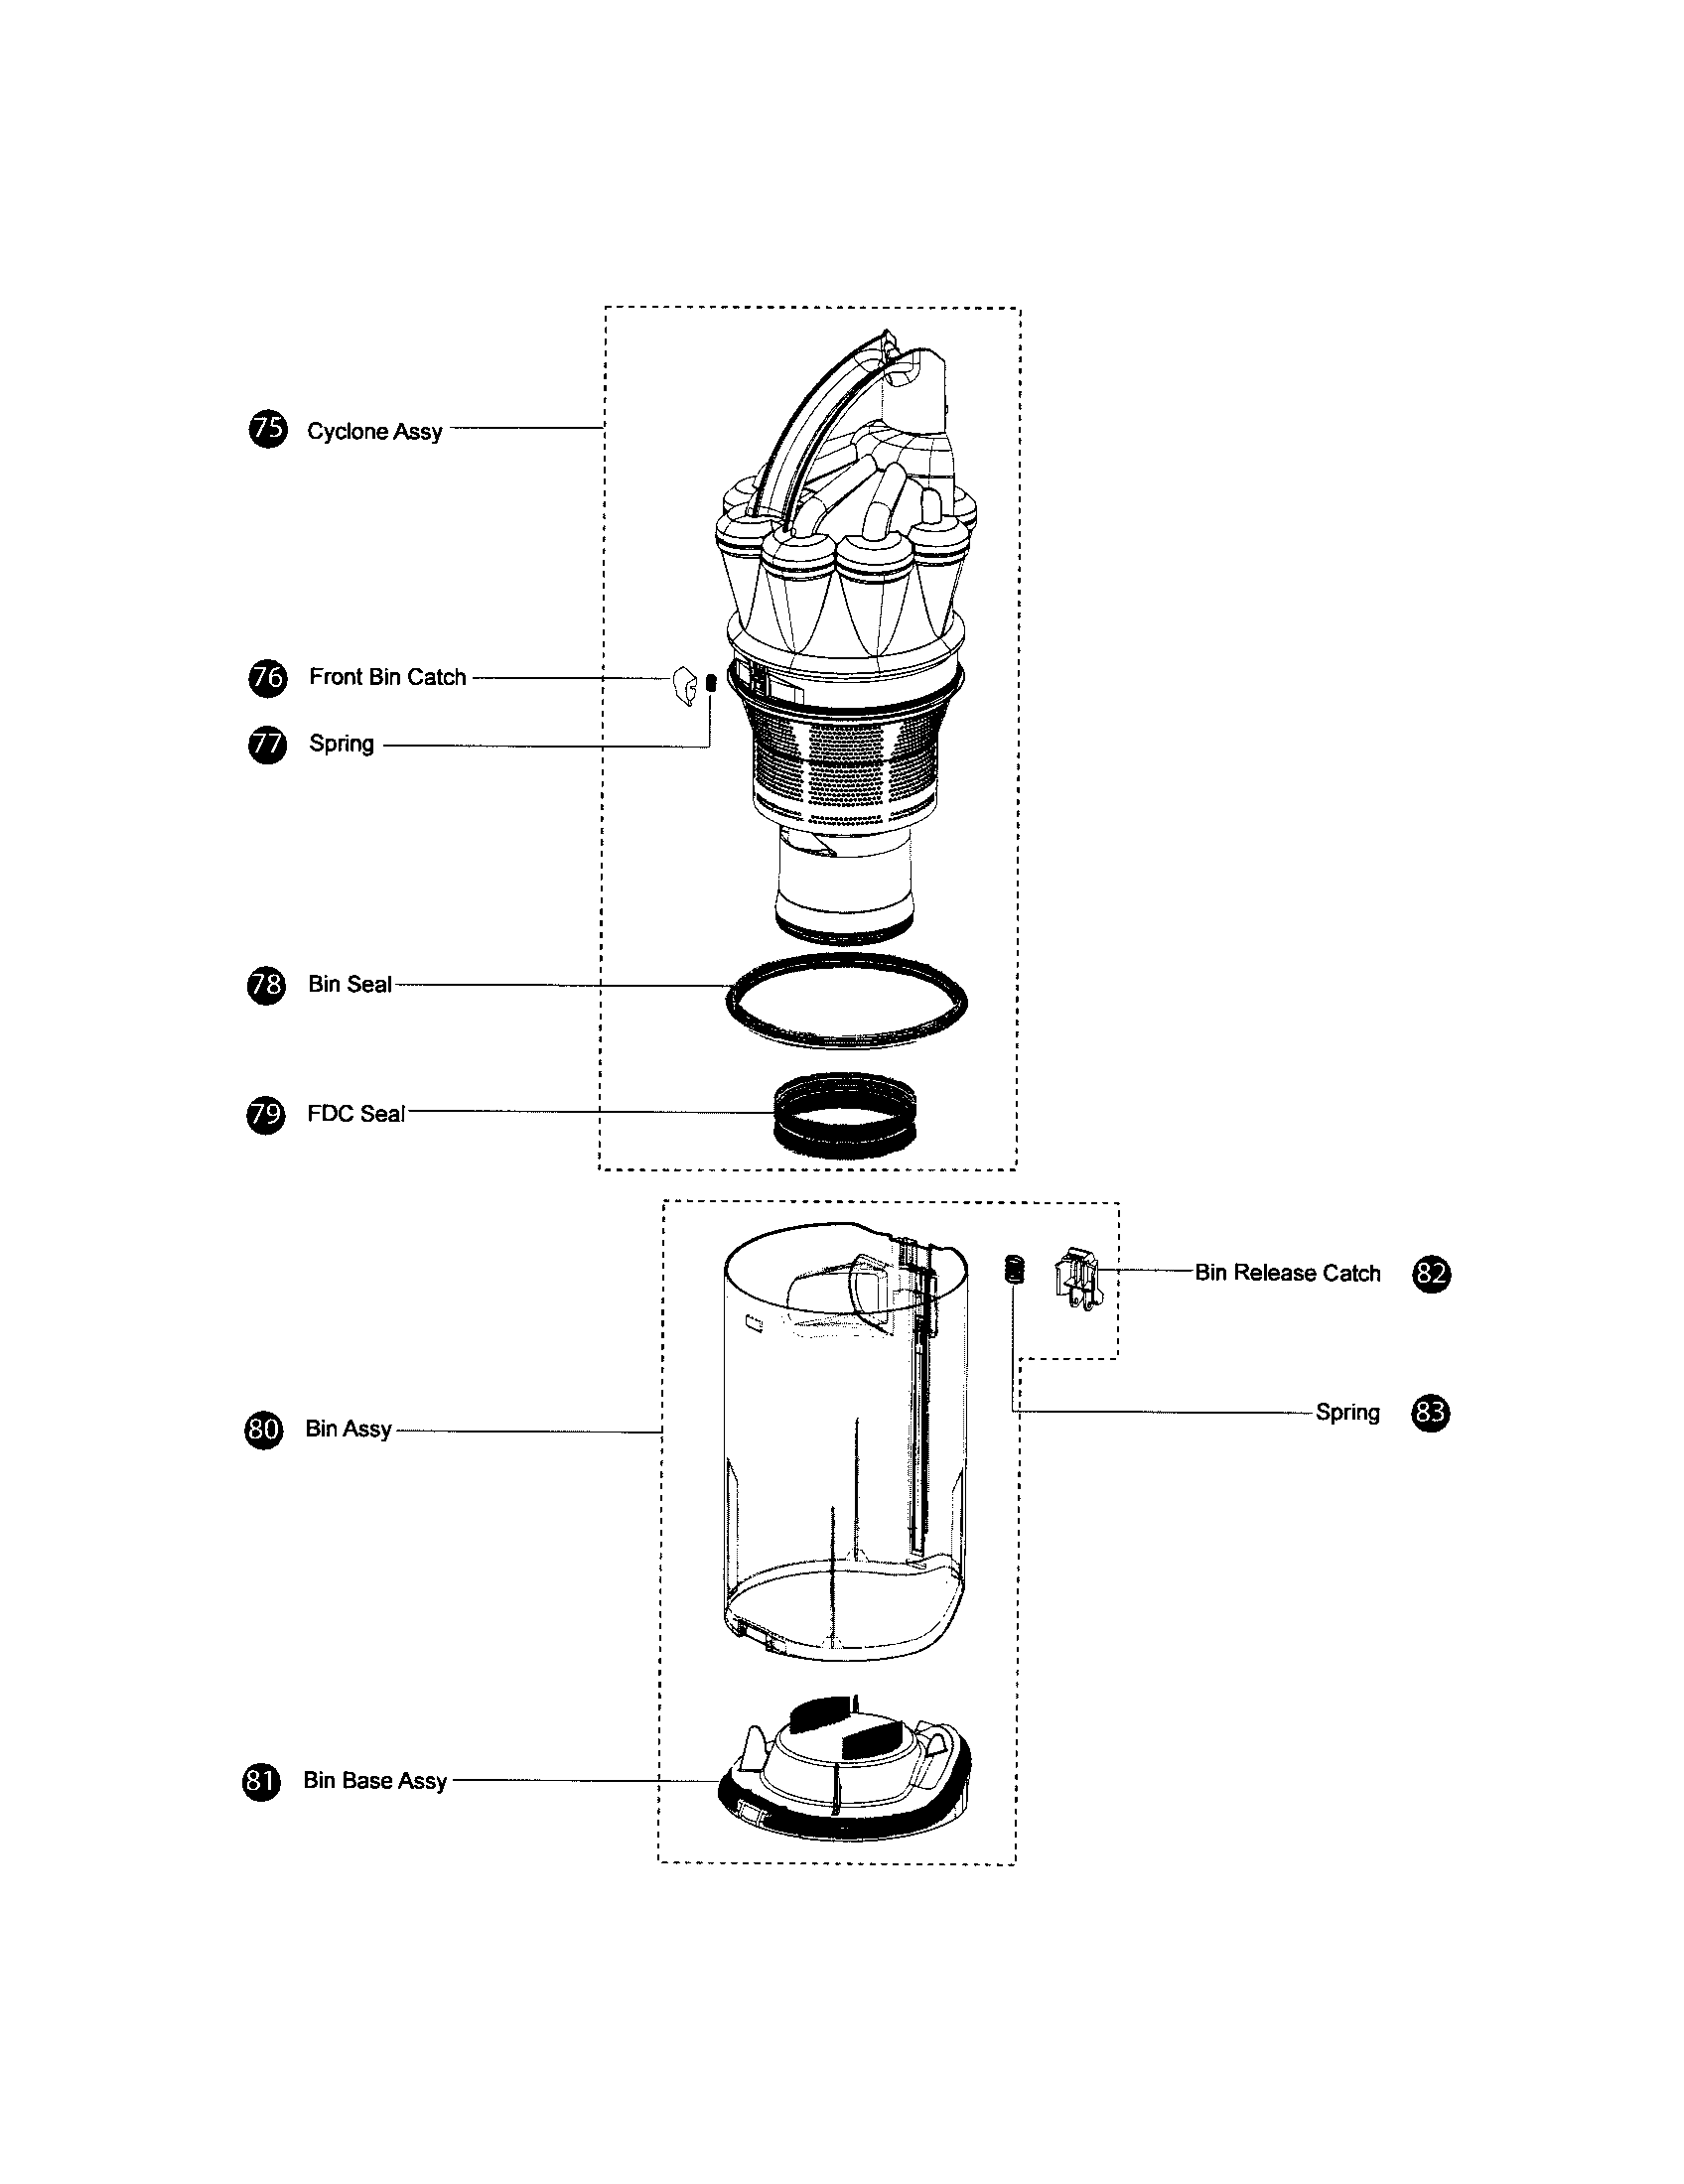 Vacuum Parts: Vacuum Parts Dyson